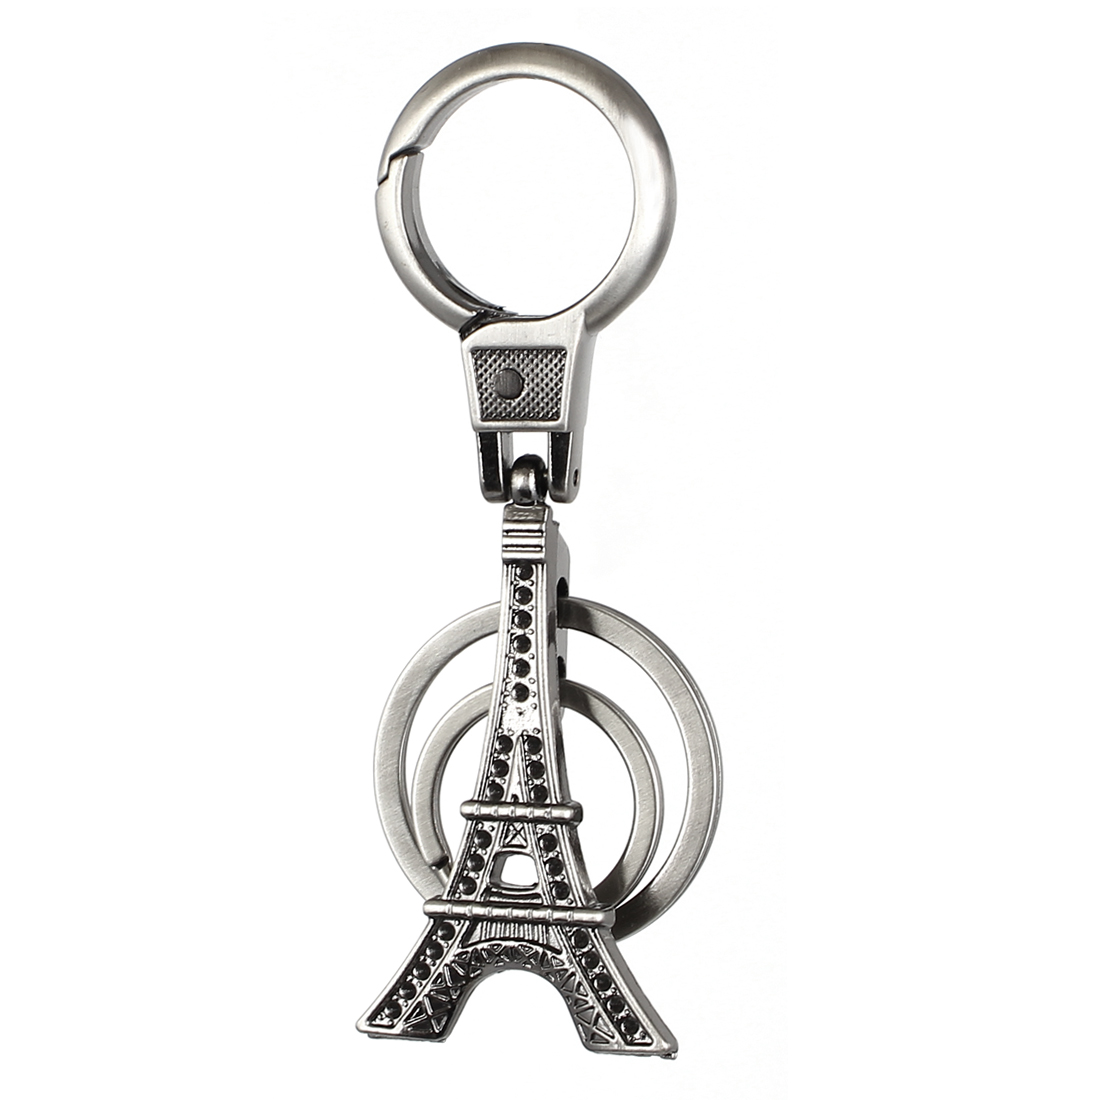 Metal Tower Shaped Pendant Carabiner Ring Clip Key Chain Keyring Decor Silver Tone